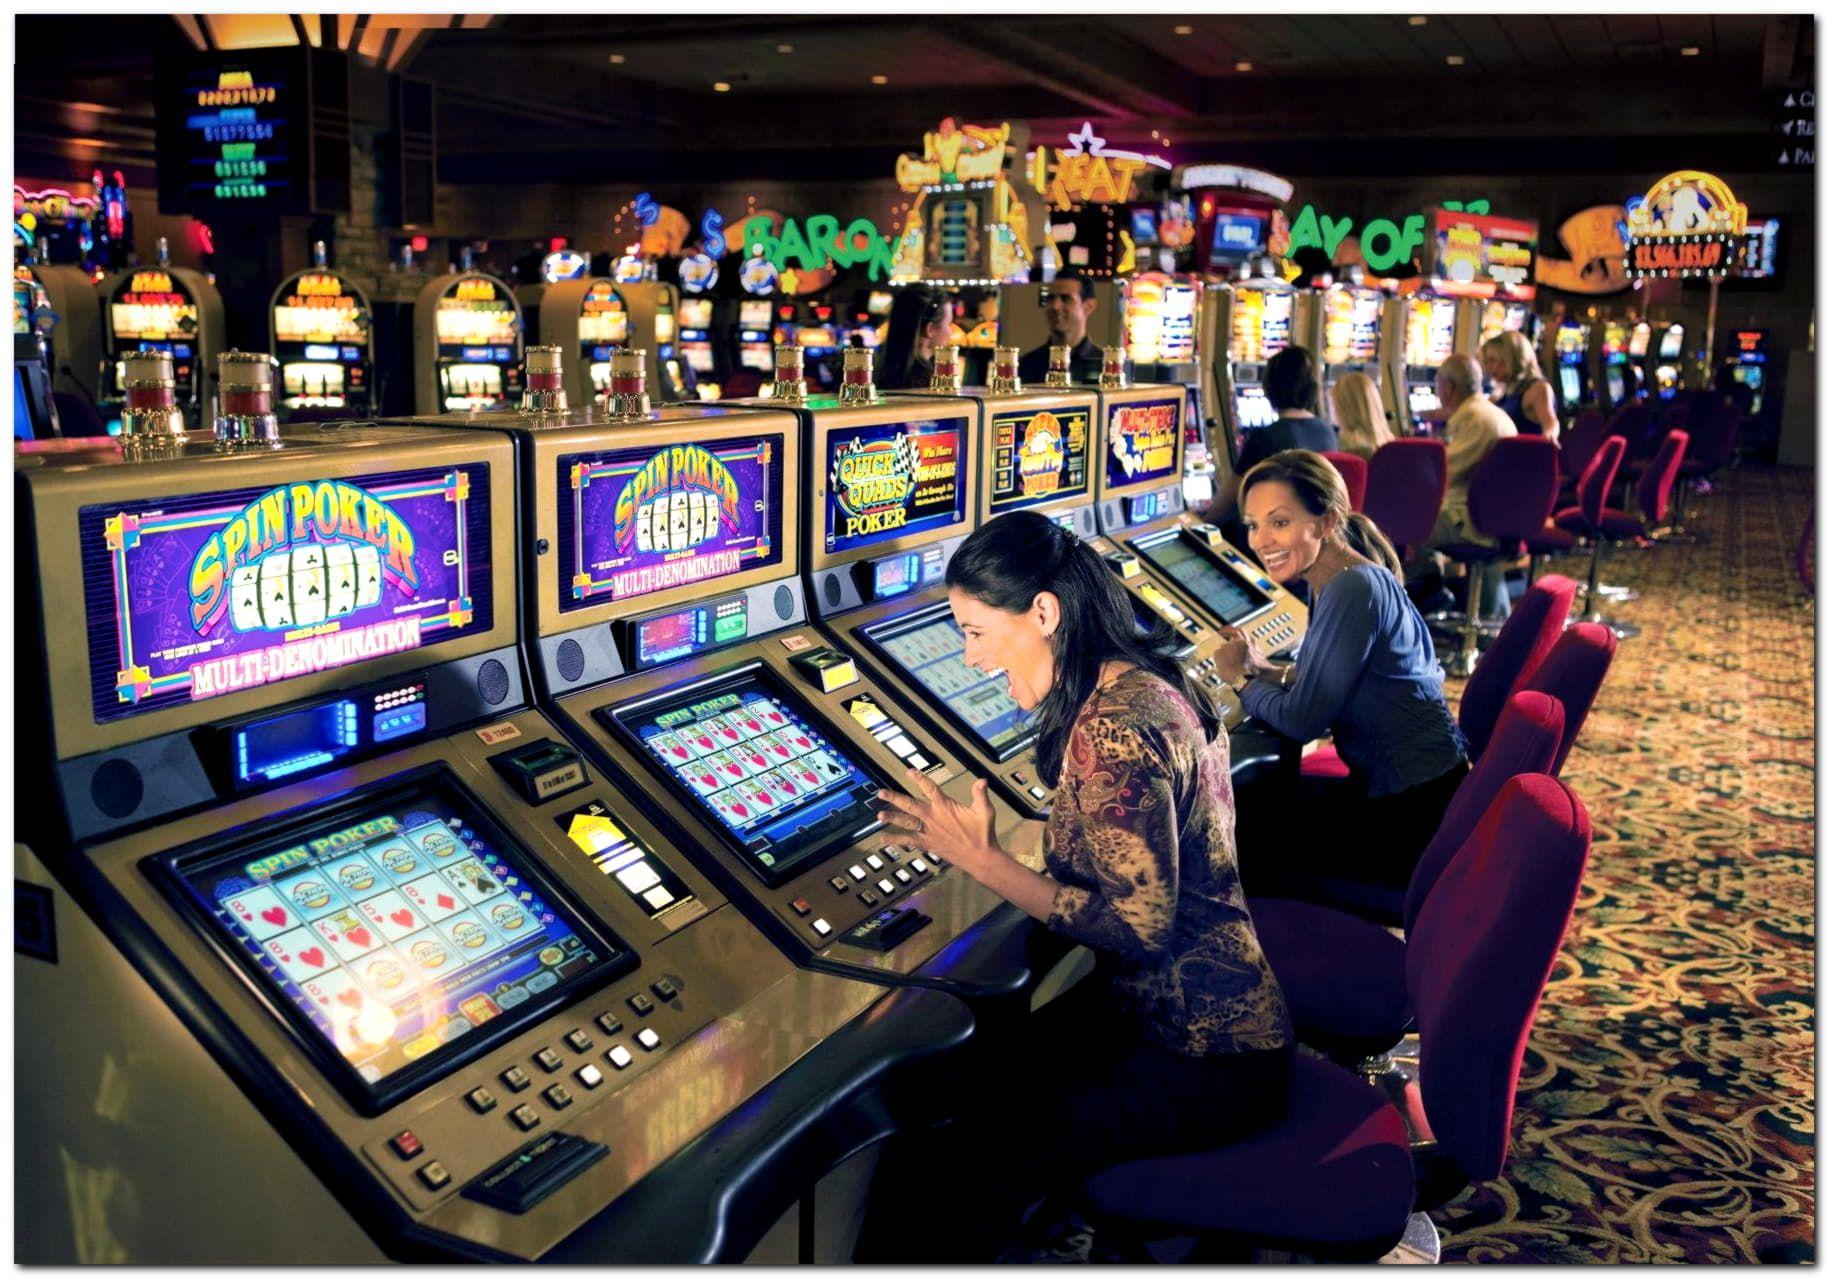 25 free spins casino at cherry casino video poker